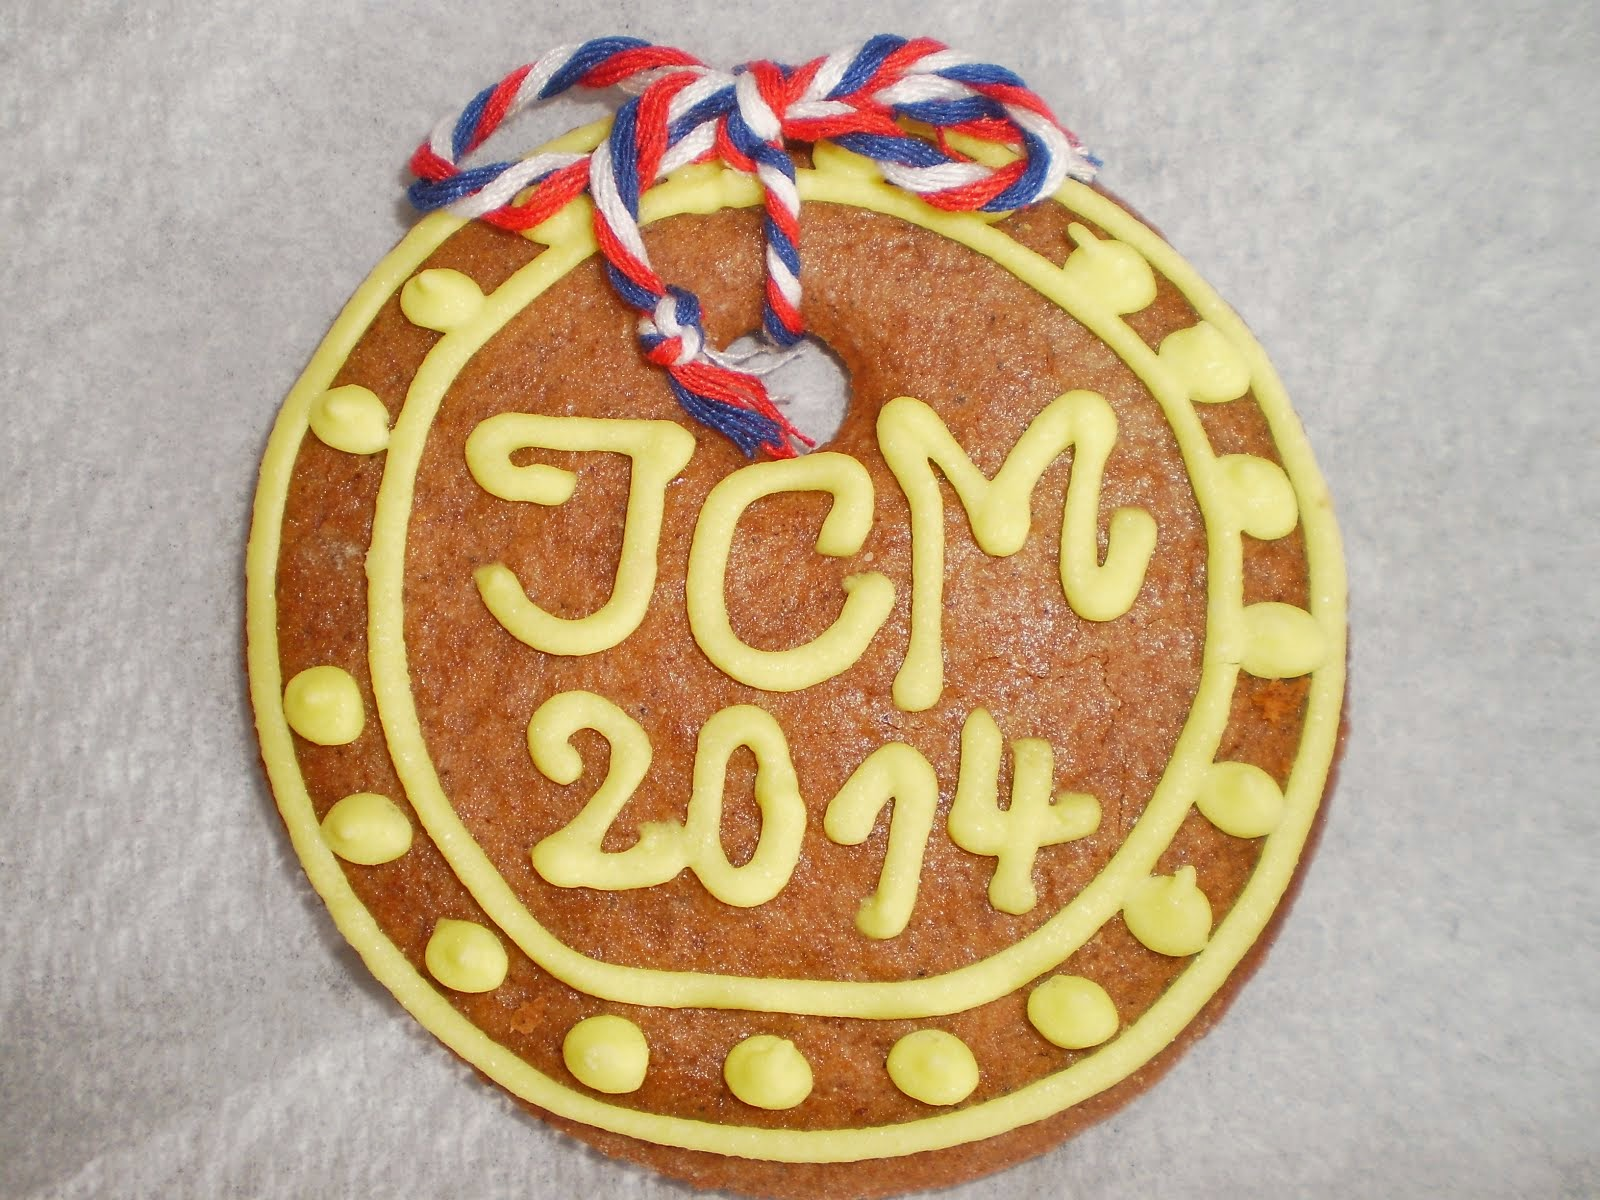 31. Jirkovský Crossmarathon 14.6.2014 :-)